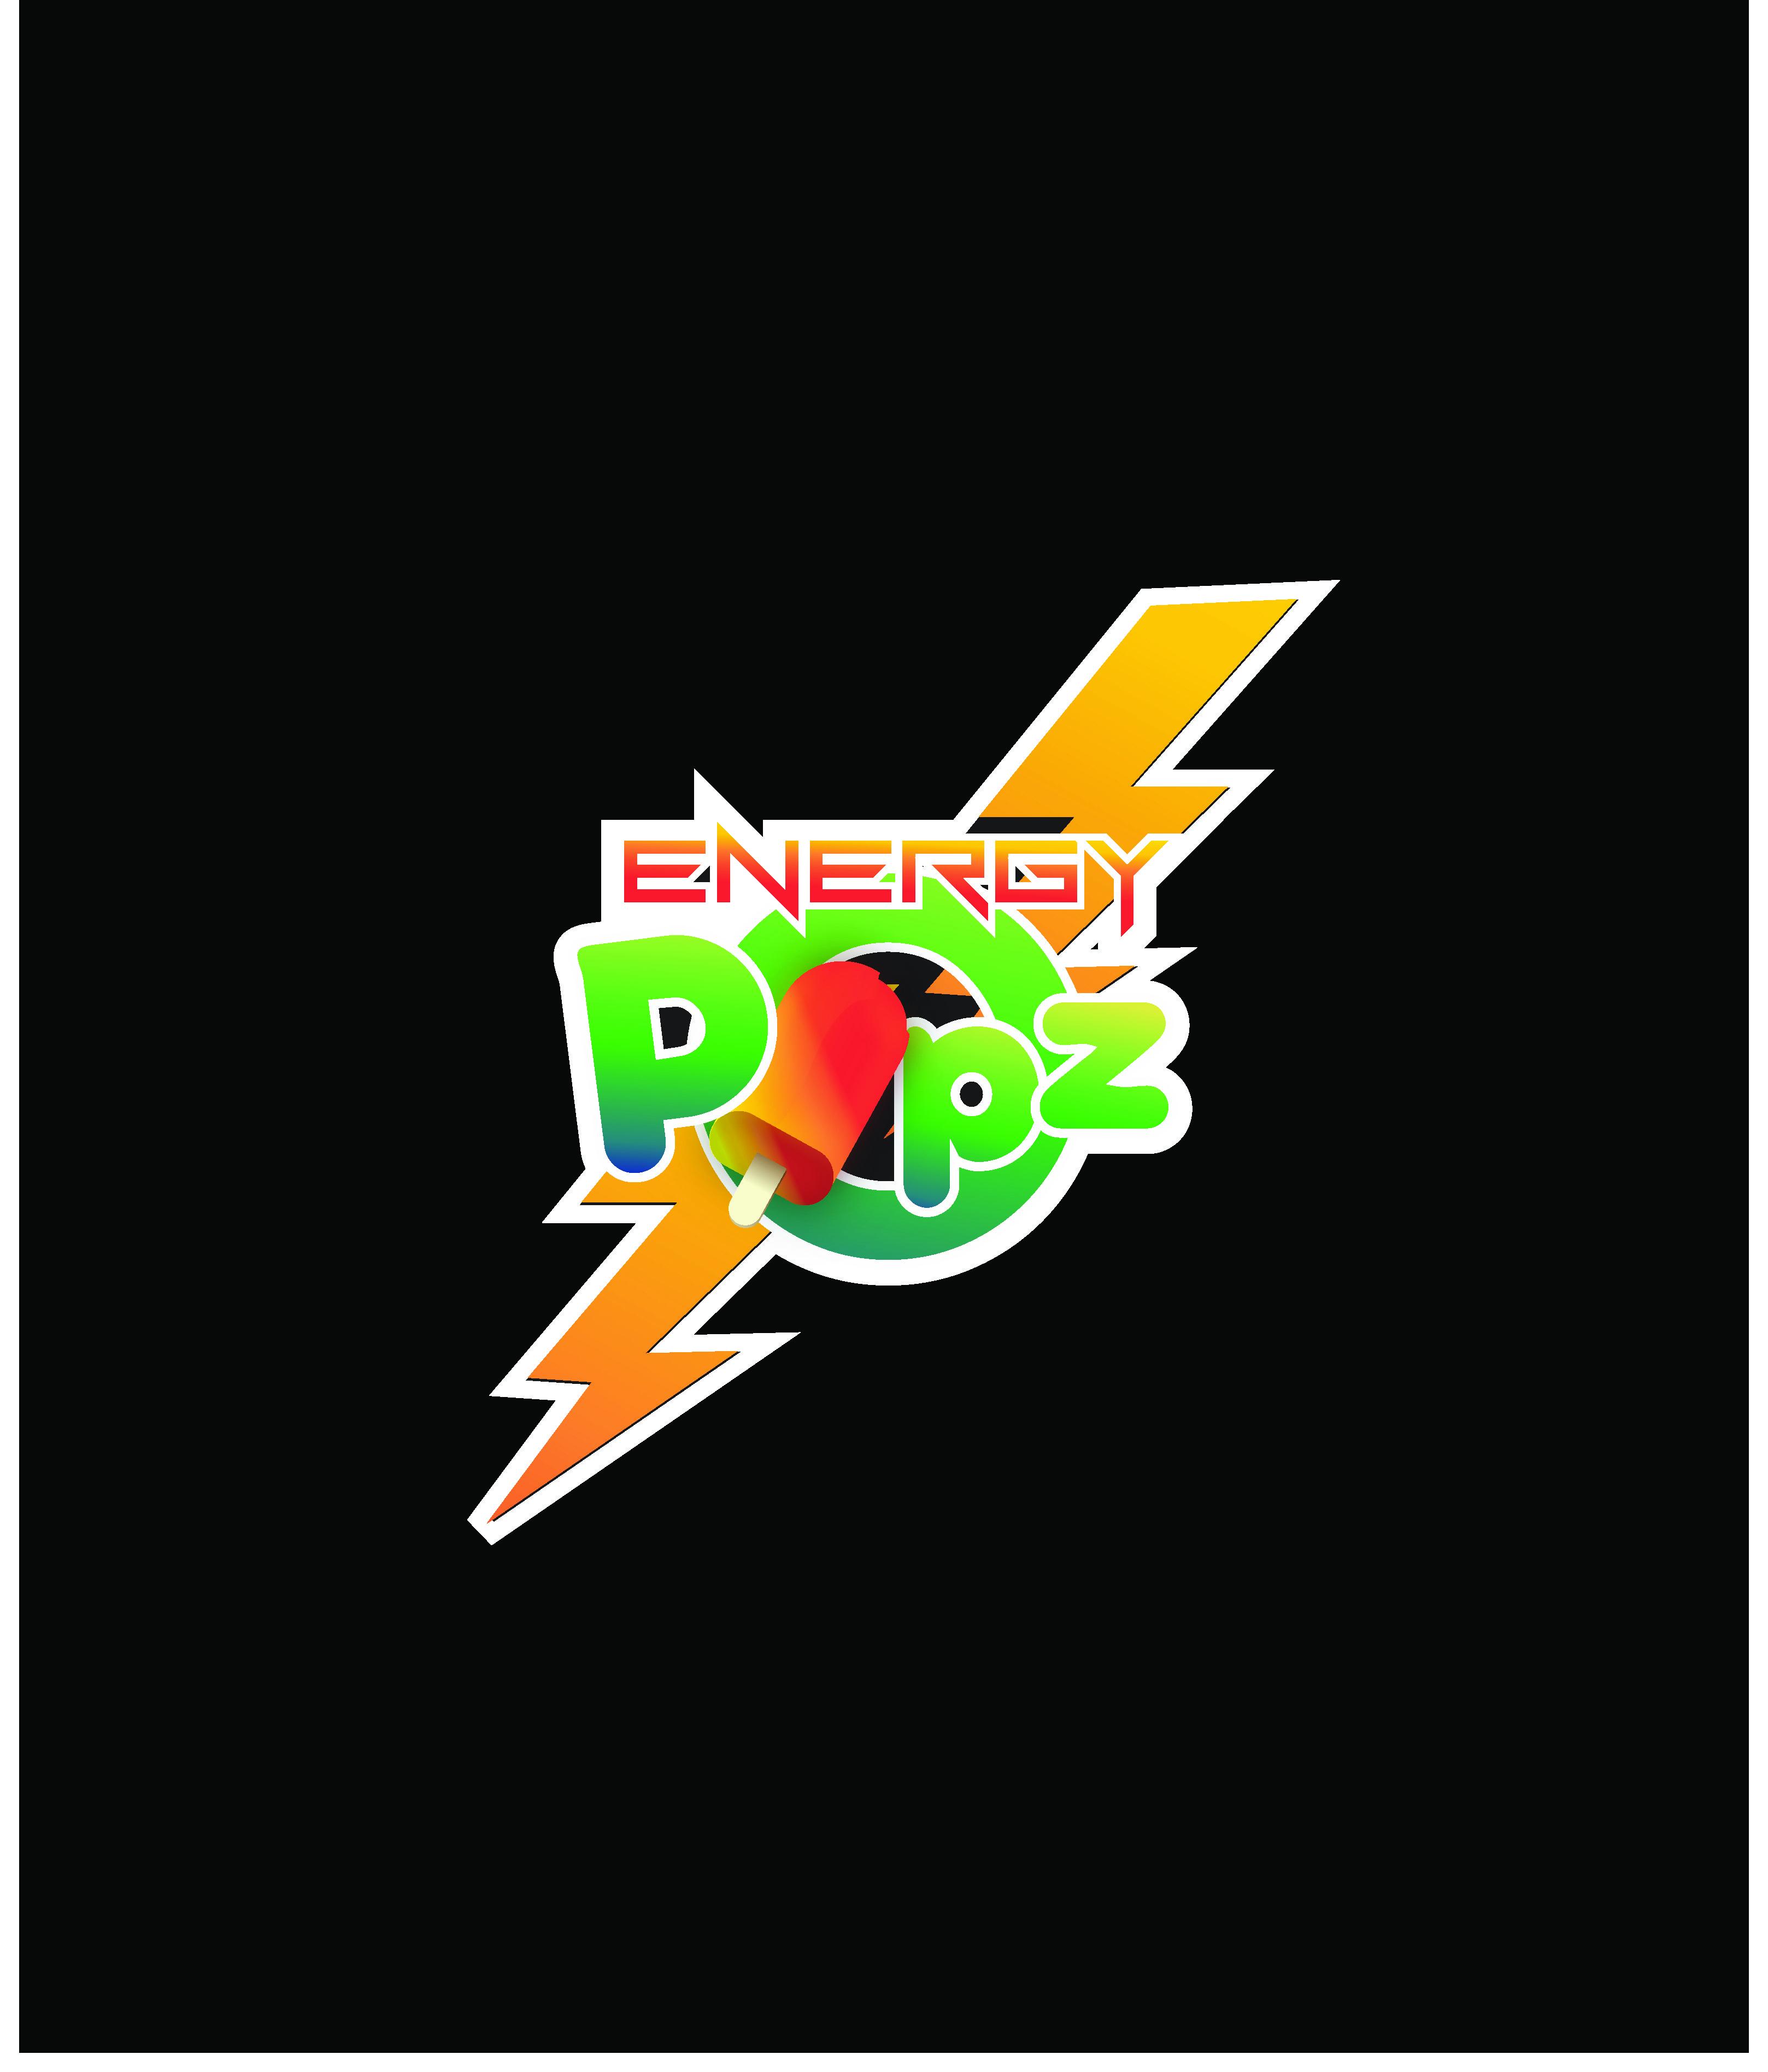 Logo Design by Sampath Gunathilaka - Entry No. 23 in the Logo Design Contest Energy Popz Logo Design.